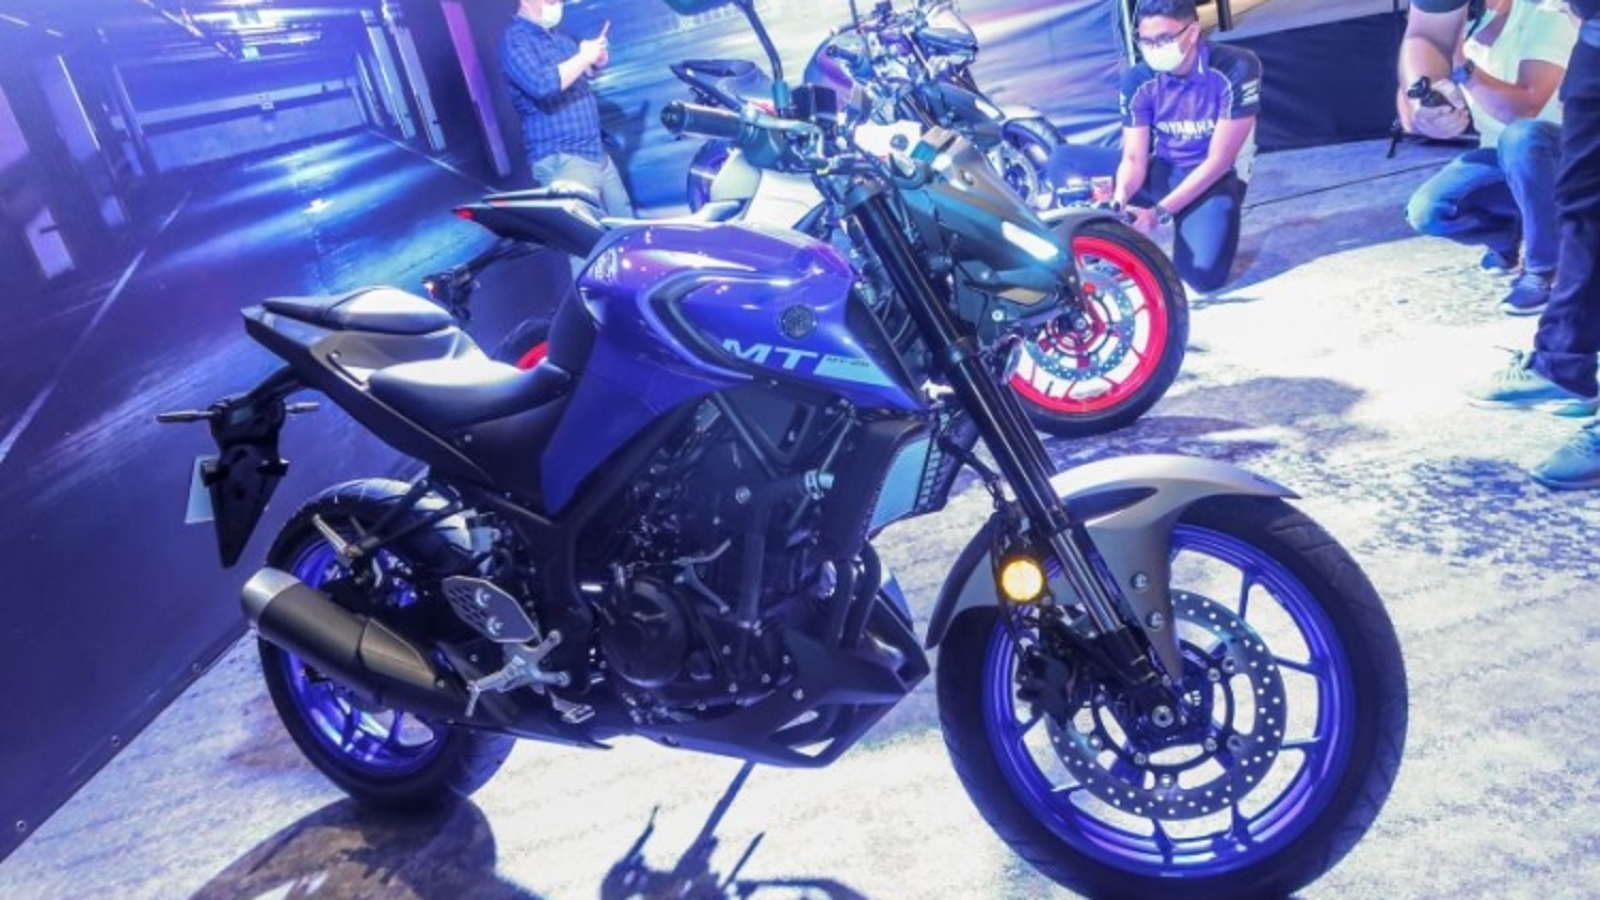 Ảnh chi tiết Yamaha MT-25 2020 vừa ra mắt